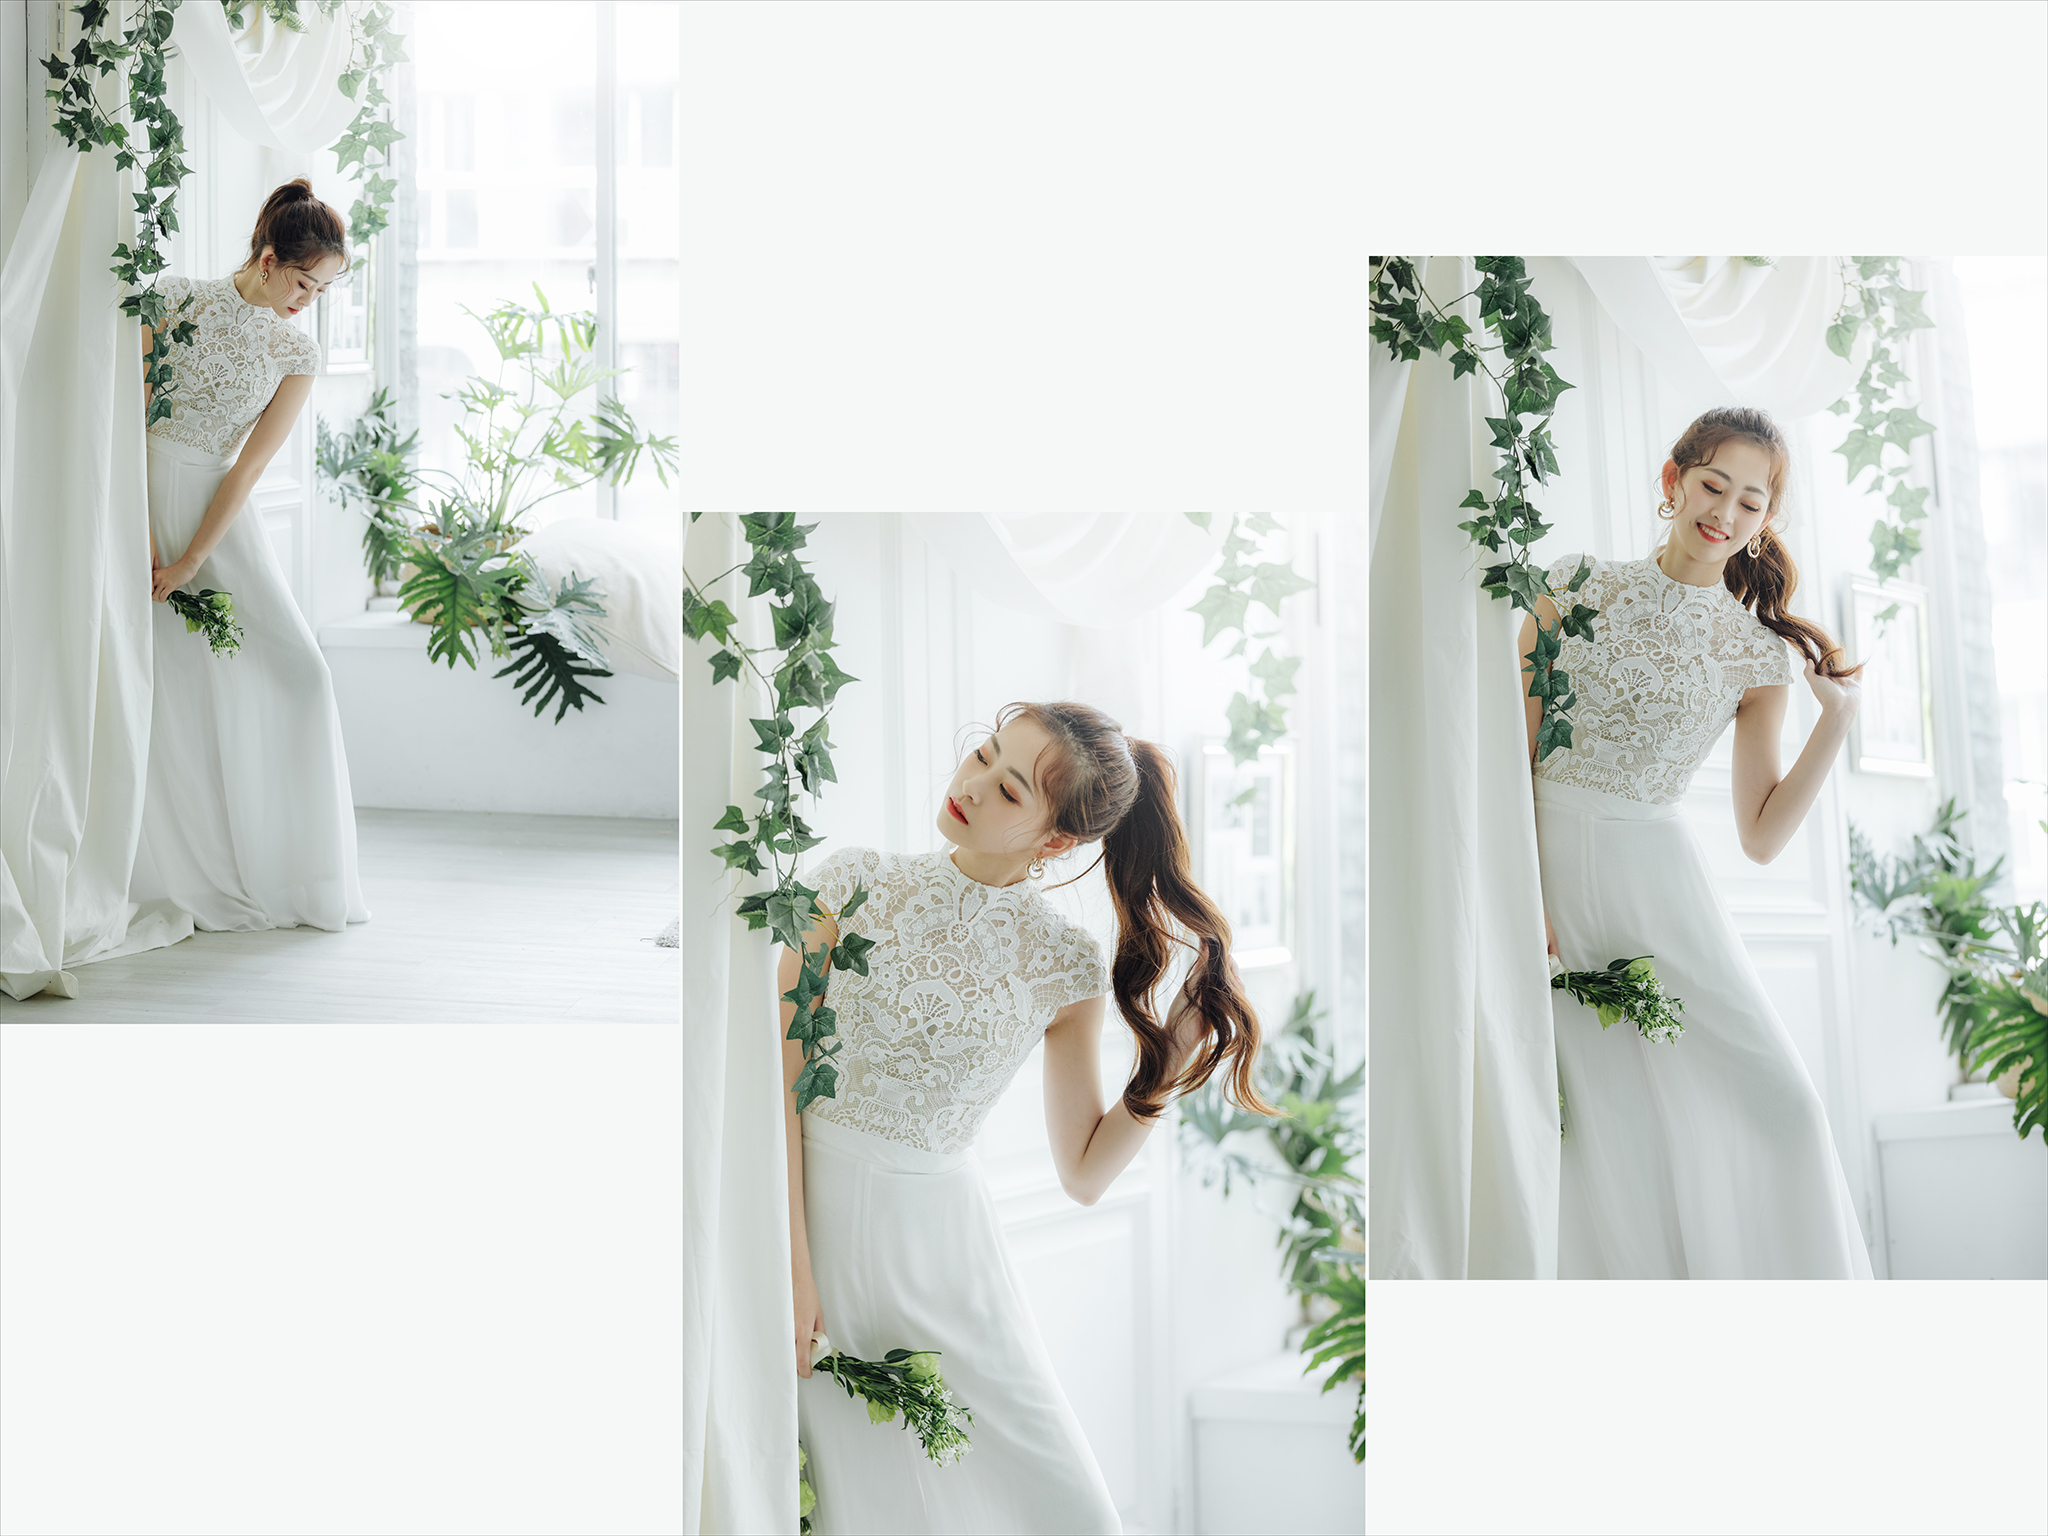 49929254836 5b3fe74748 o - 【閨蜜婚紗】+Jessy & Tiffany+